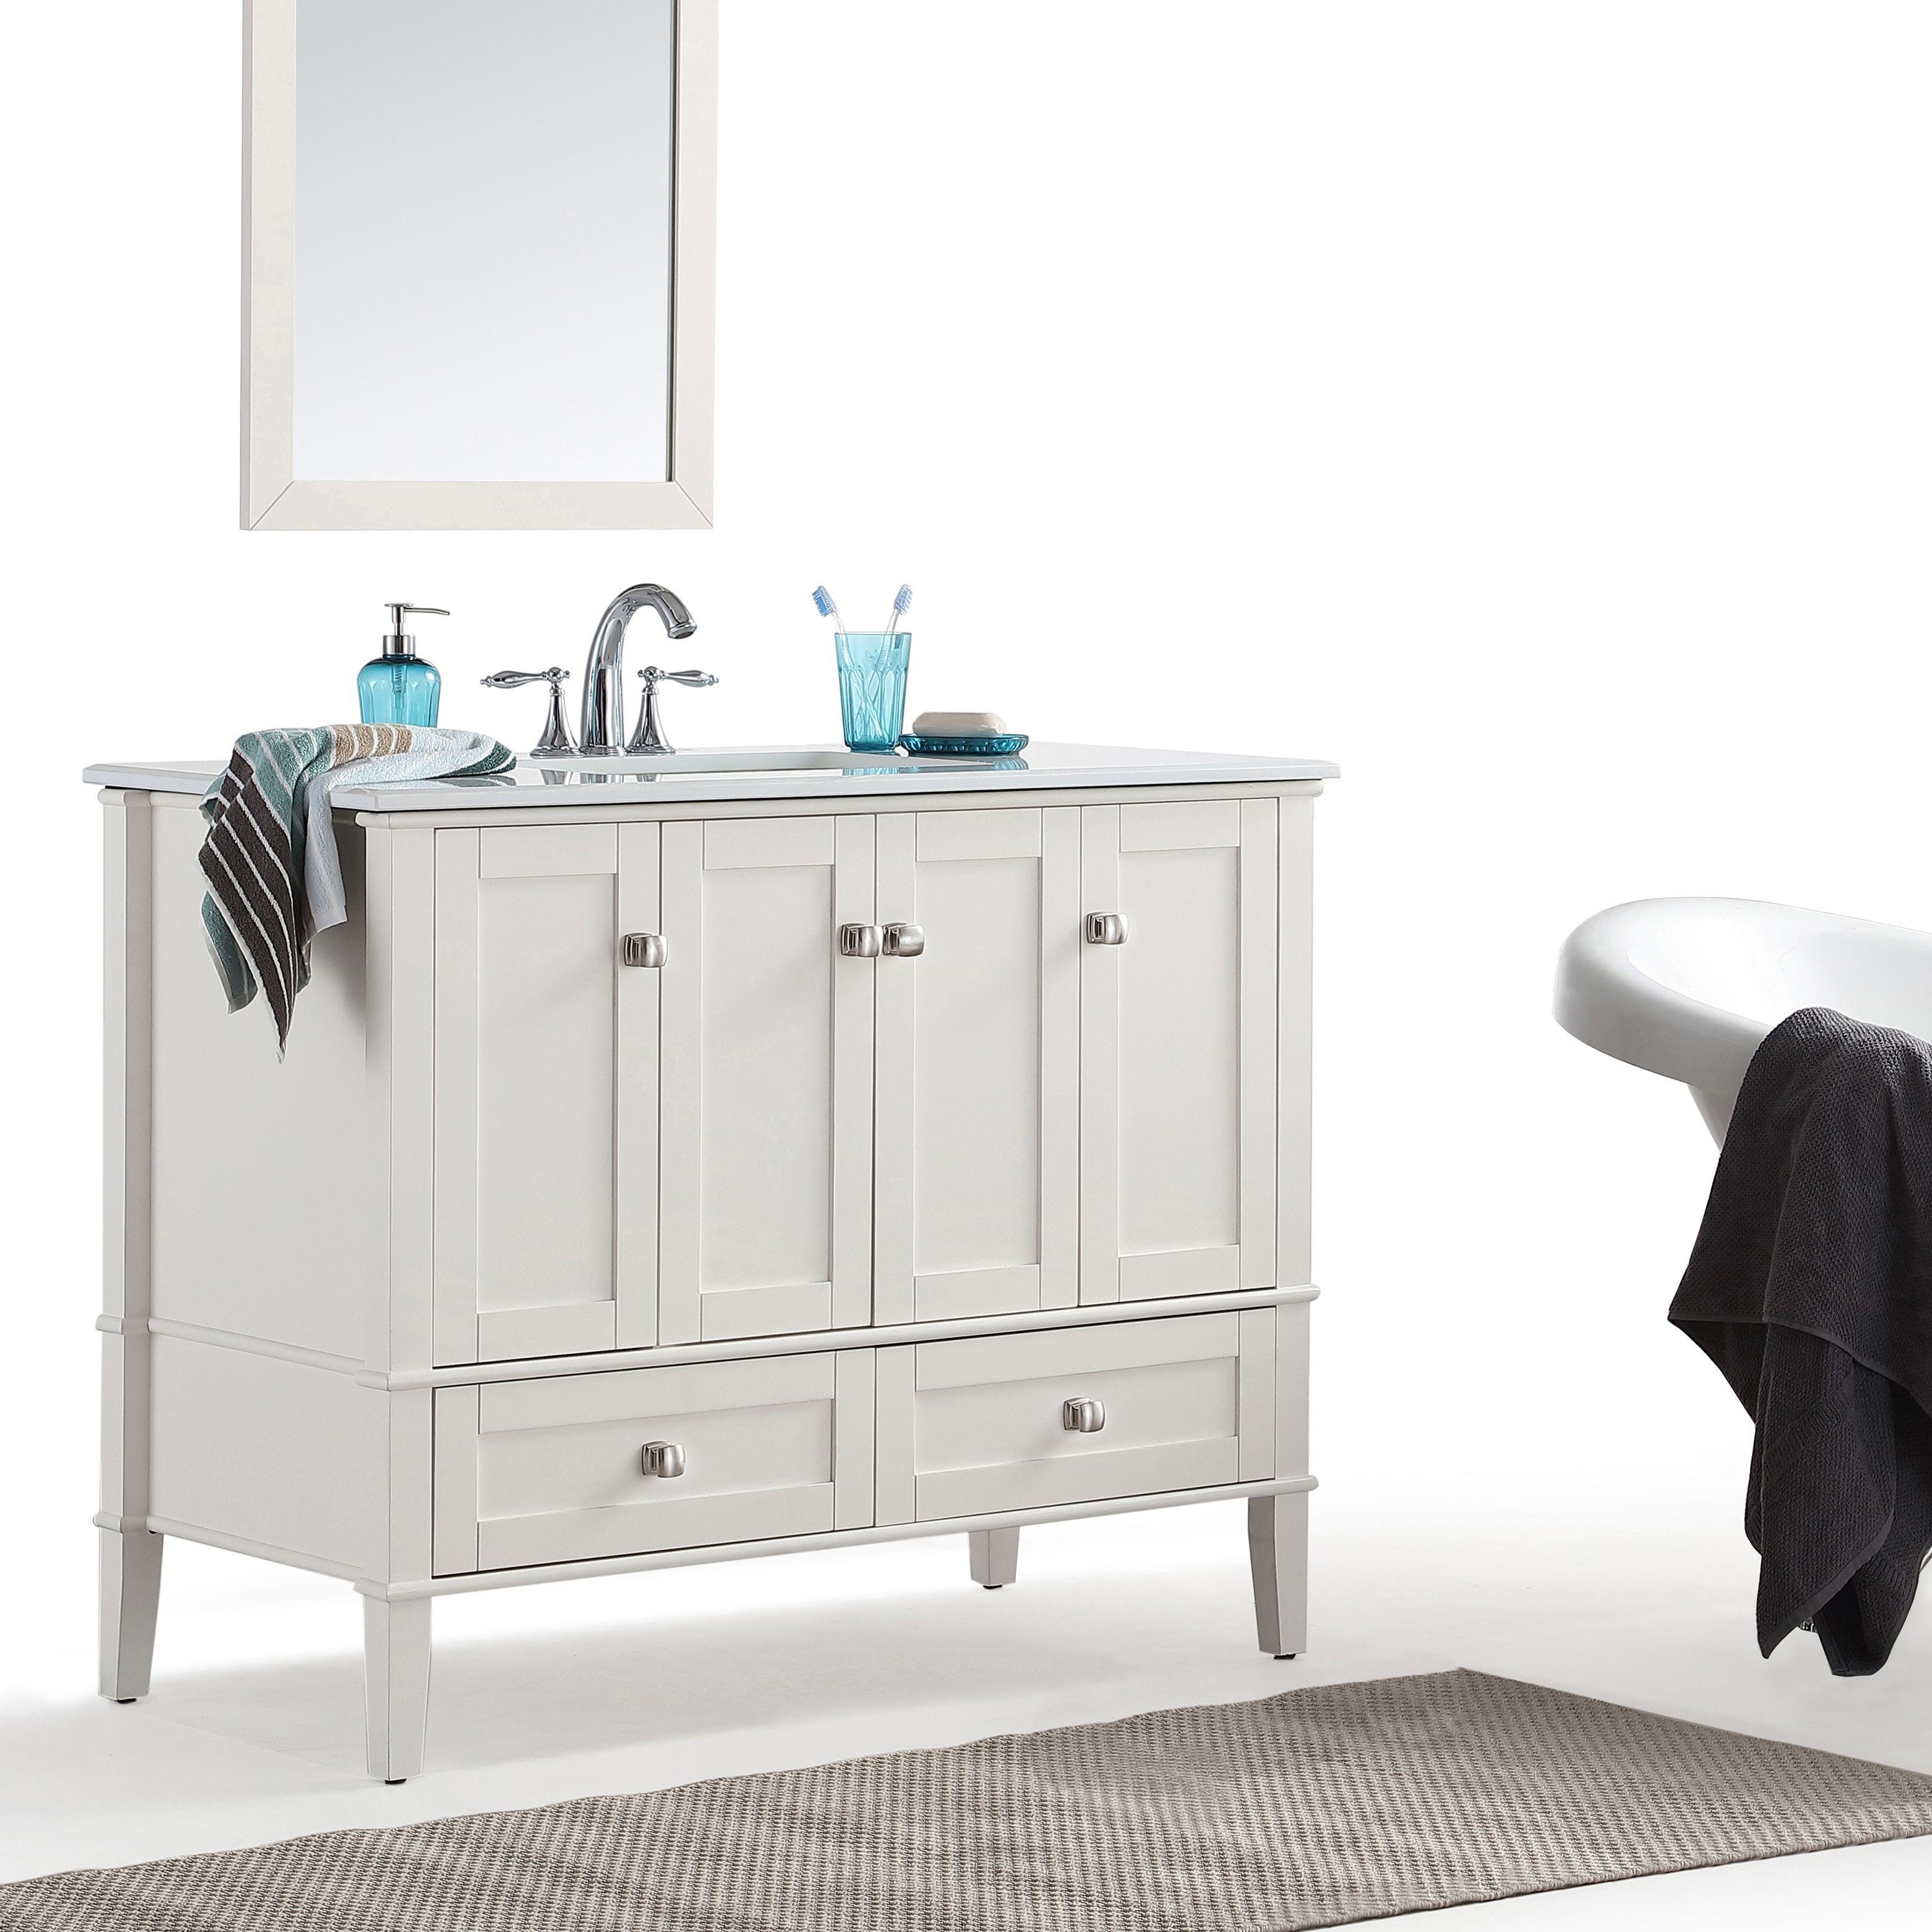 Wyndenhall Windham Soft White 42-inch Bath Vanity with White Quartz Marble Top (White), Size Single Vanities